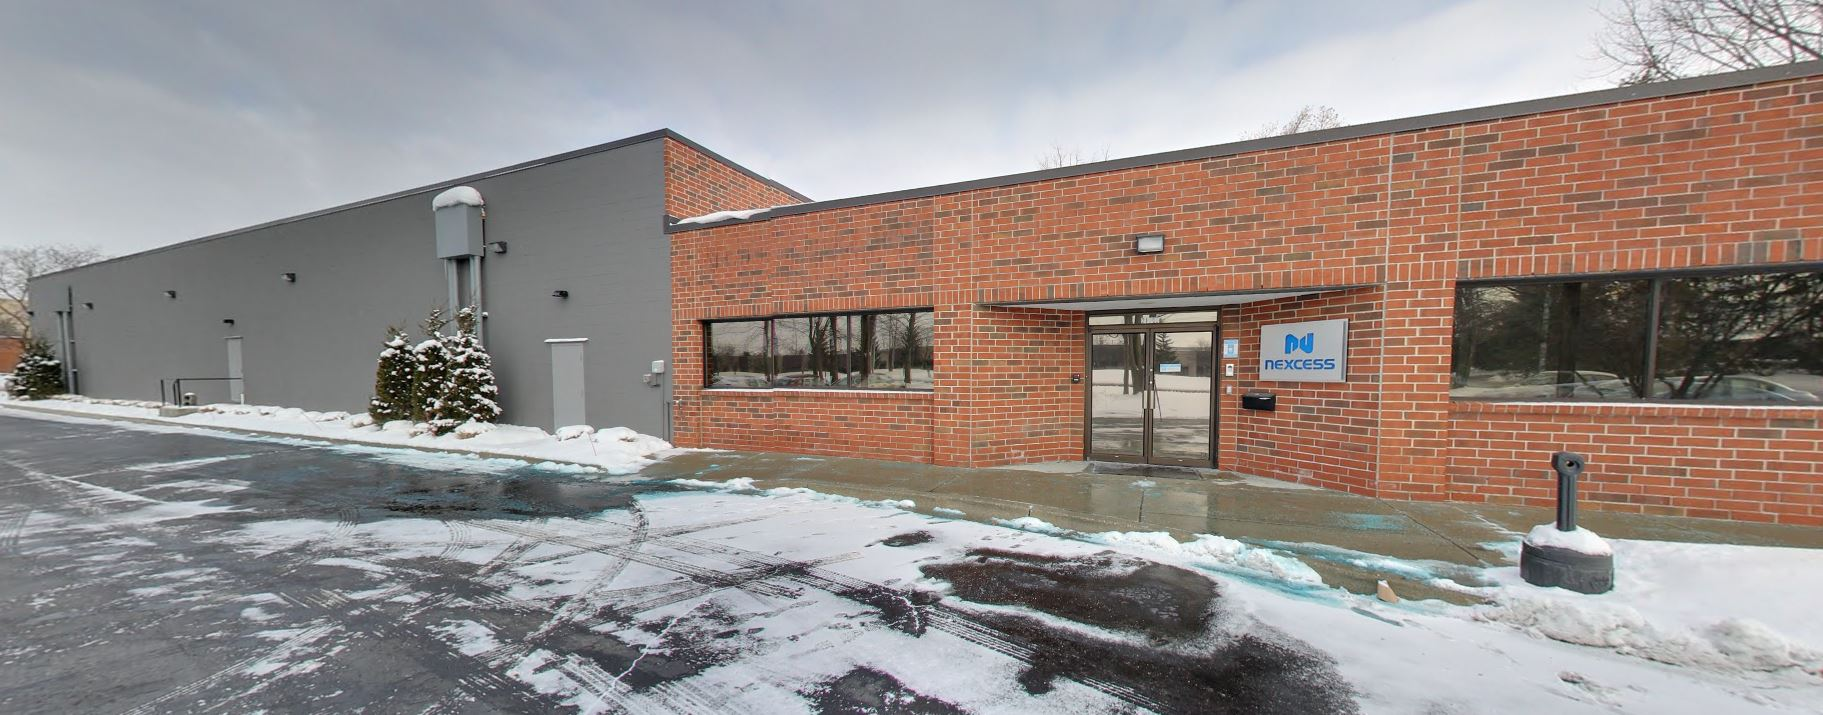 Nexcess Facility, Melrose Avenue, Southfield